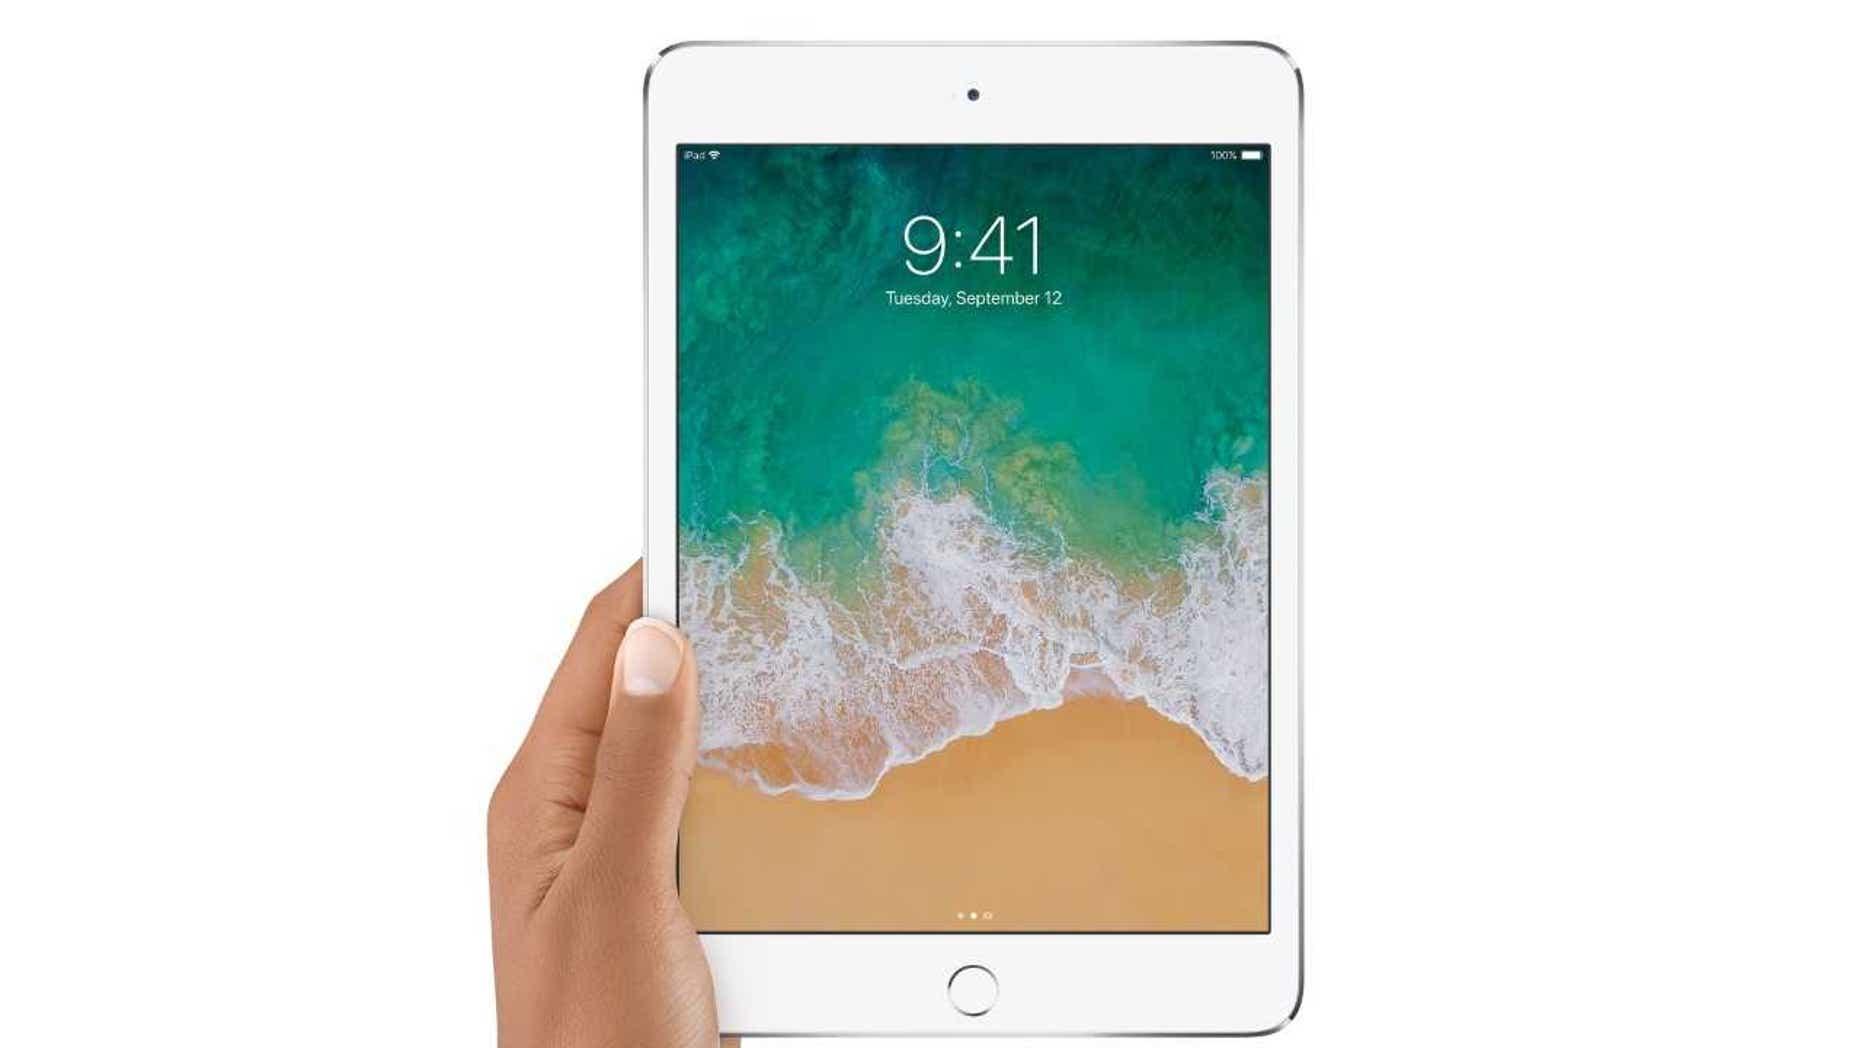 iPad Mini 4. (Credit: Apple)